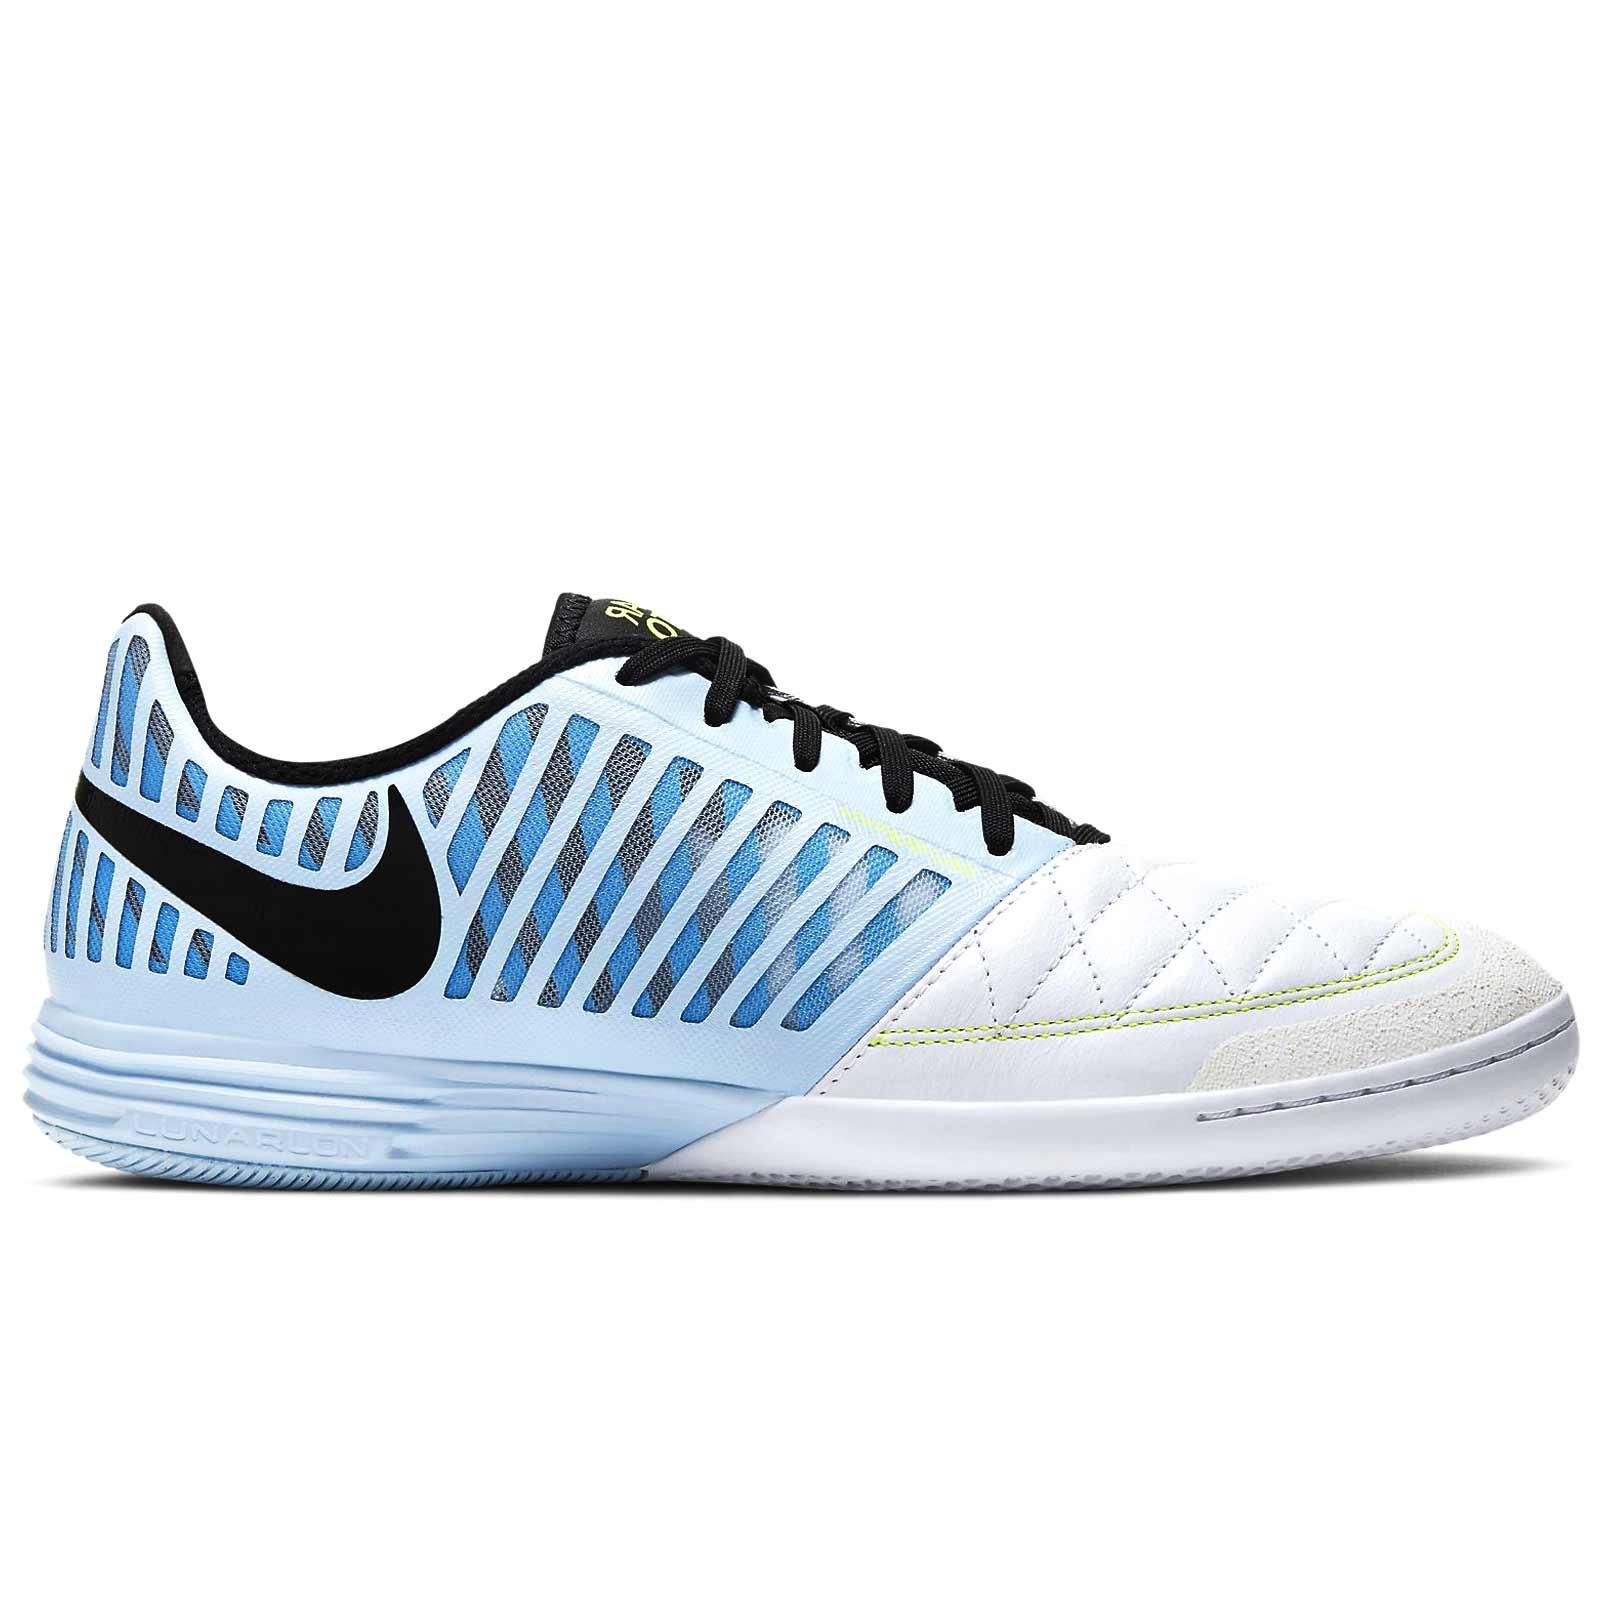 cuerda gemelo Ocurrir  Zapatillas Nike Lunar Gato 2 celeste | futbolmania